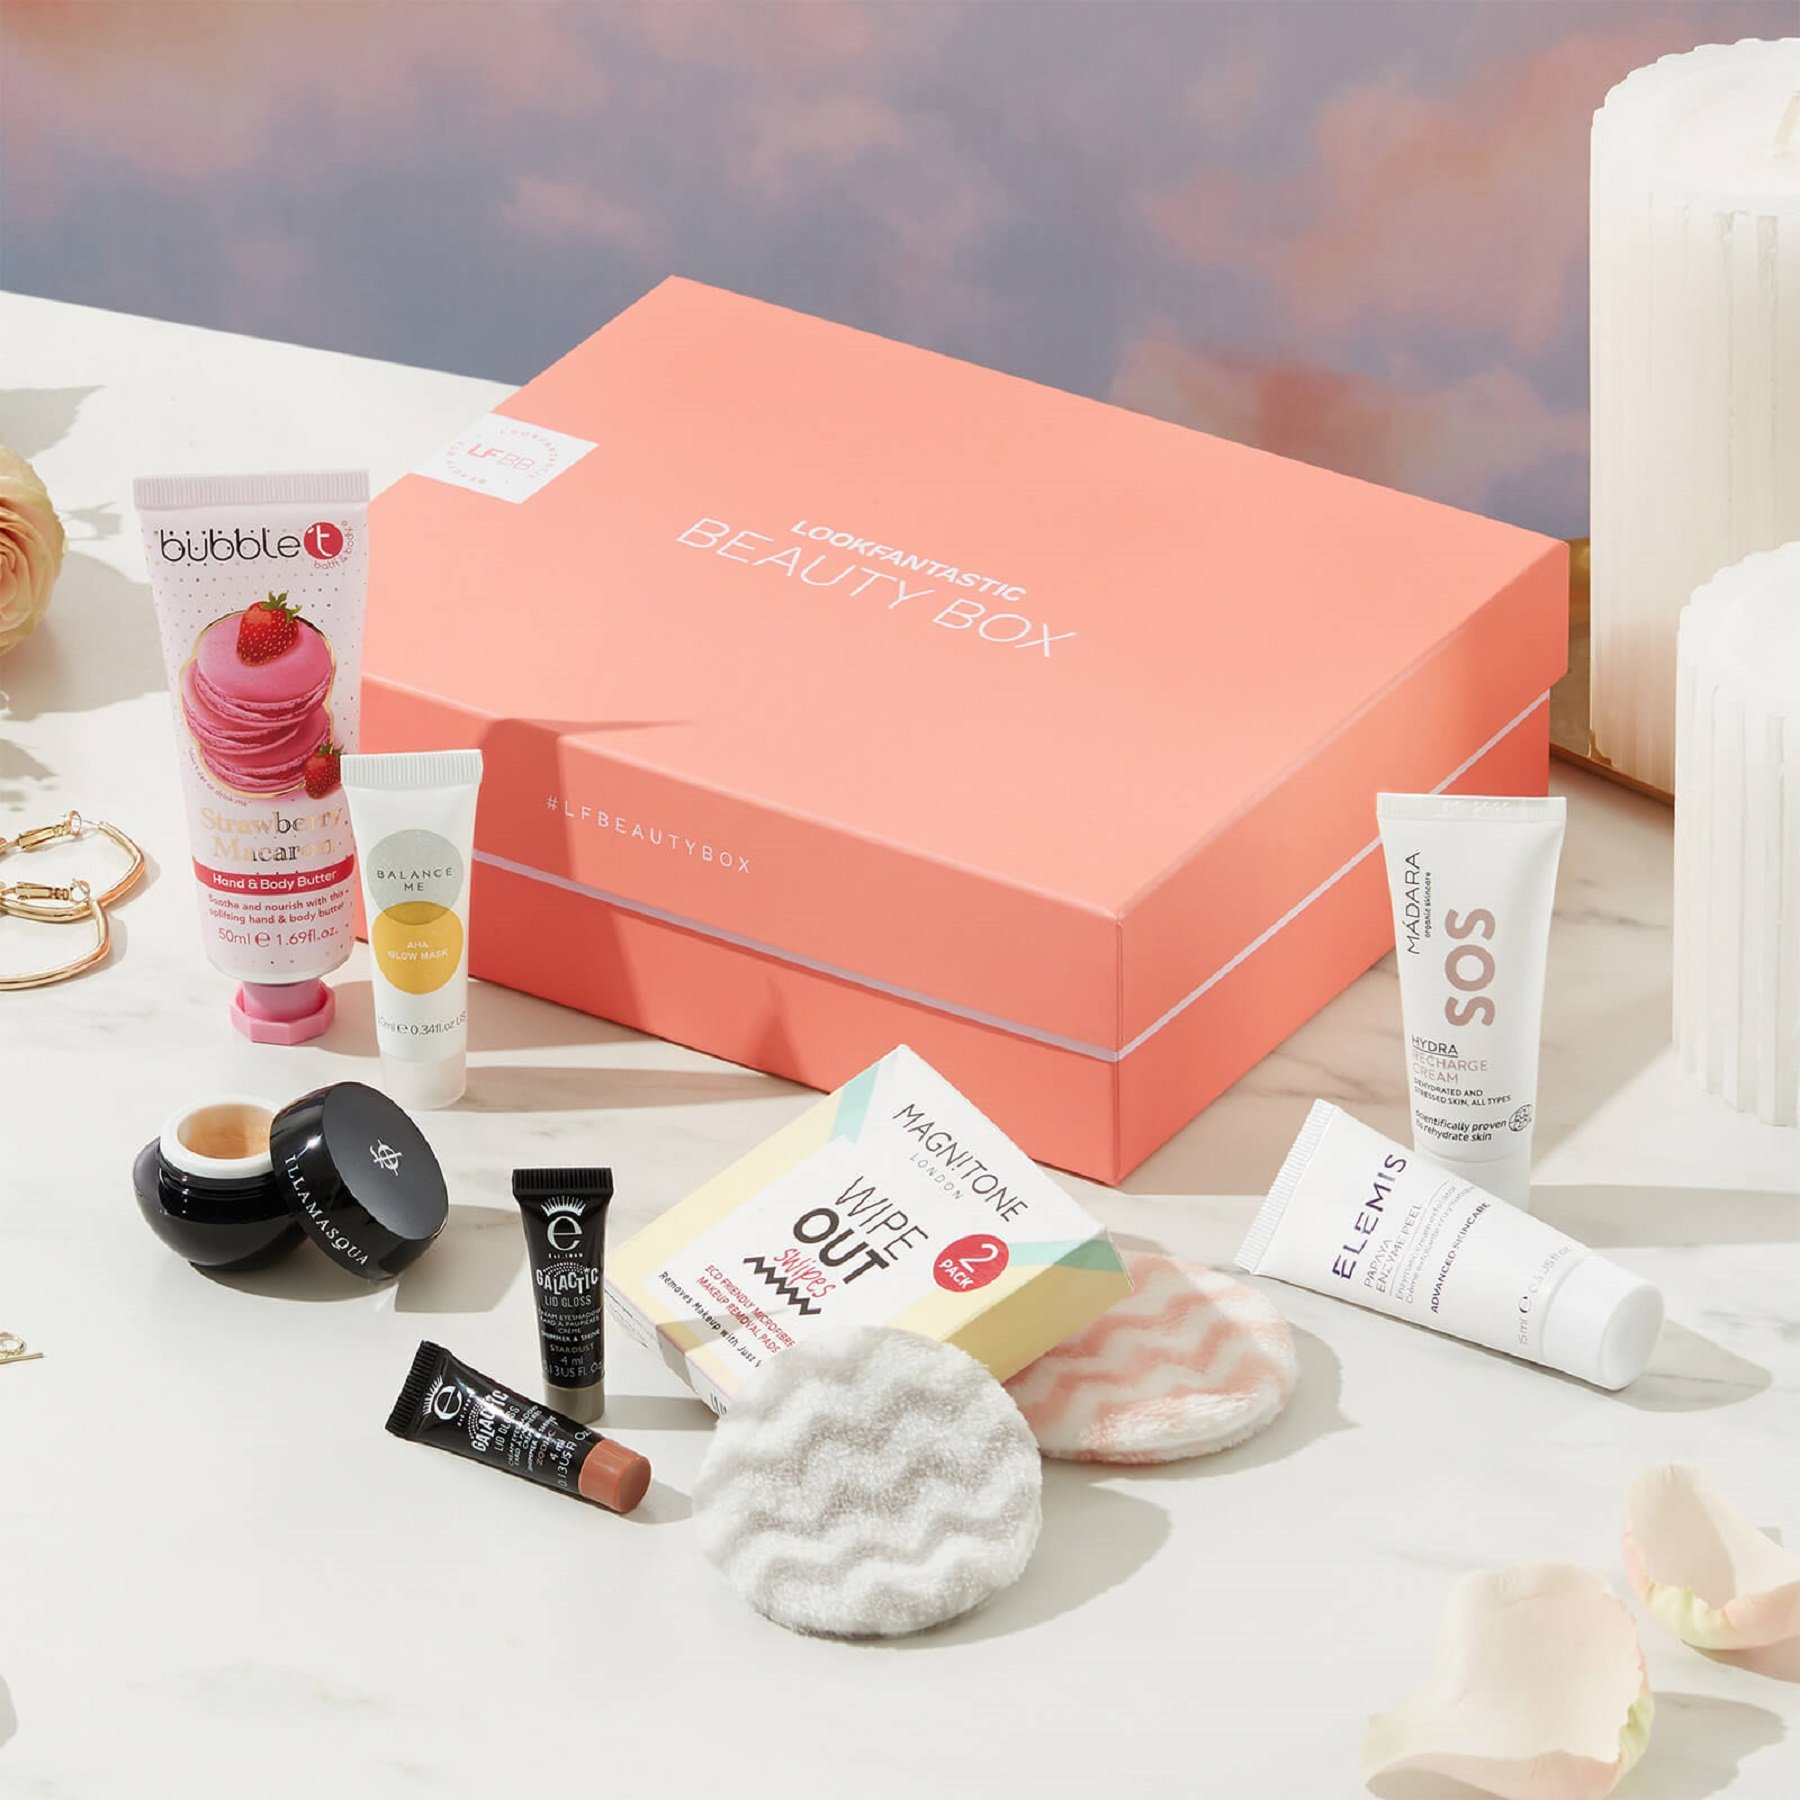 Discover our February 'Treasure' Edition LOOKFANTASTIC Beauty Box